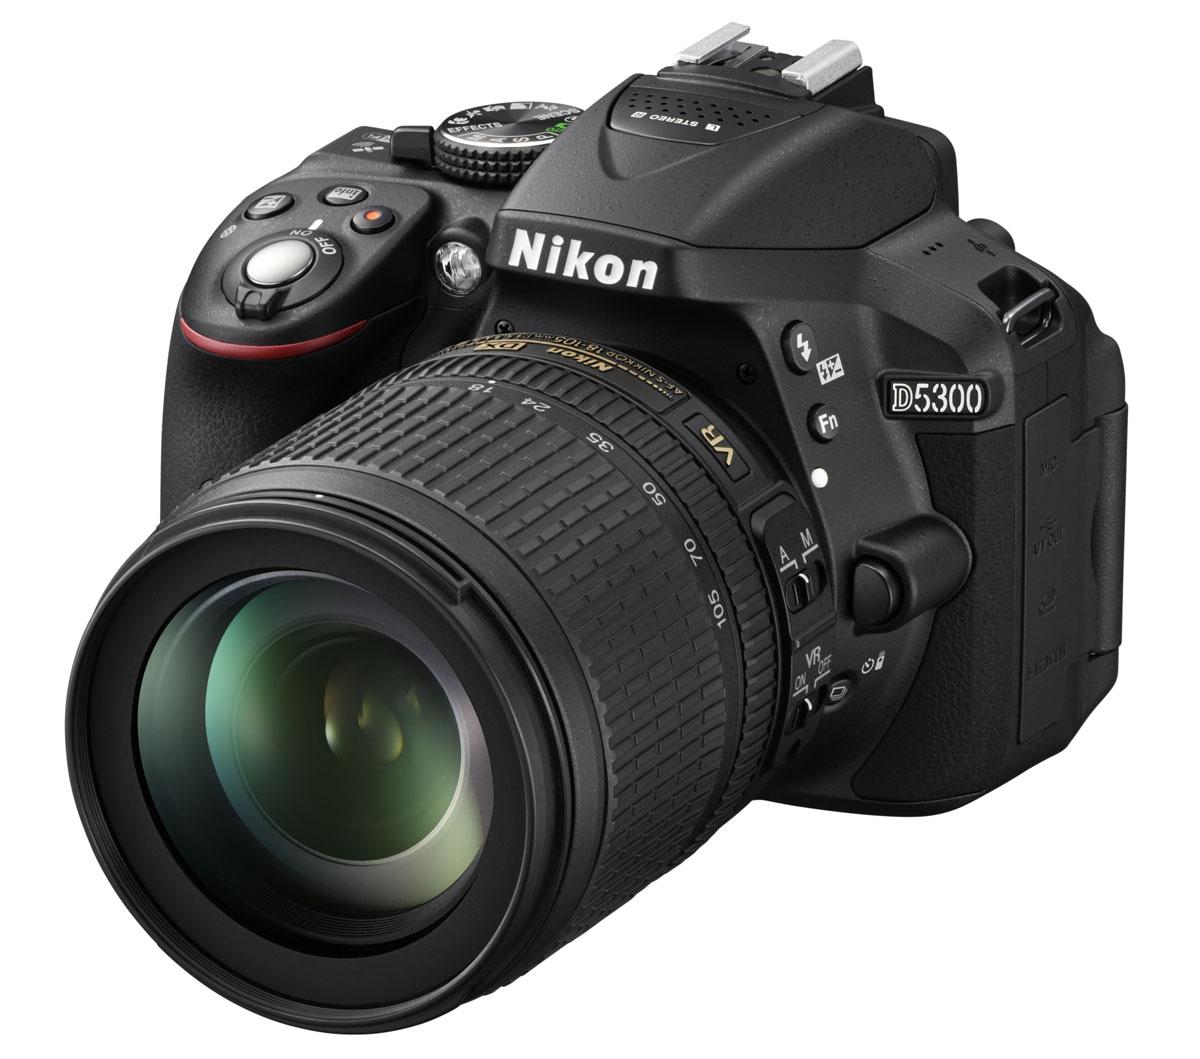 Nikon D5300 Kit 18-105 VR, Black цифровая зеркальная фотокамера ( VBA370K004 )